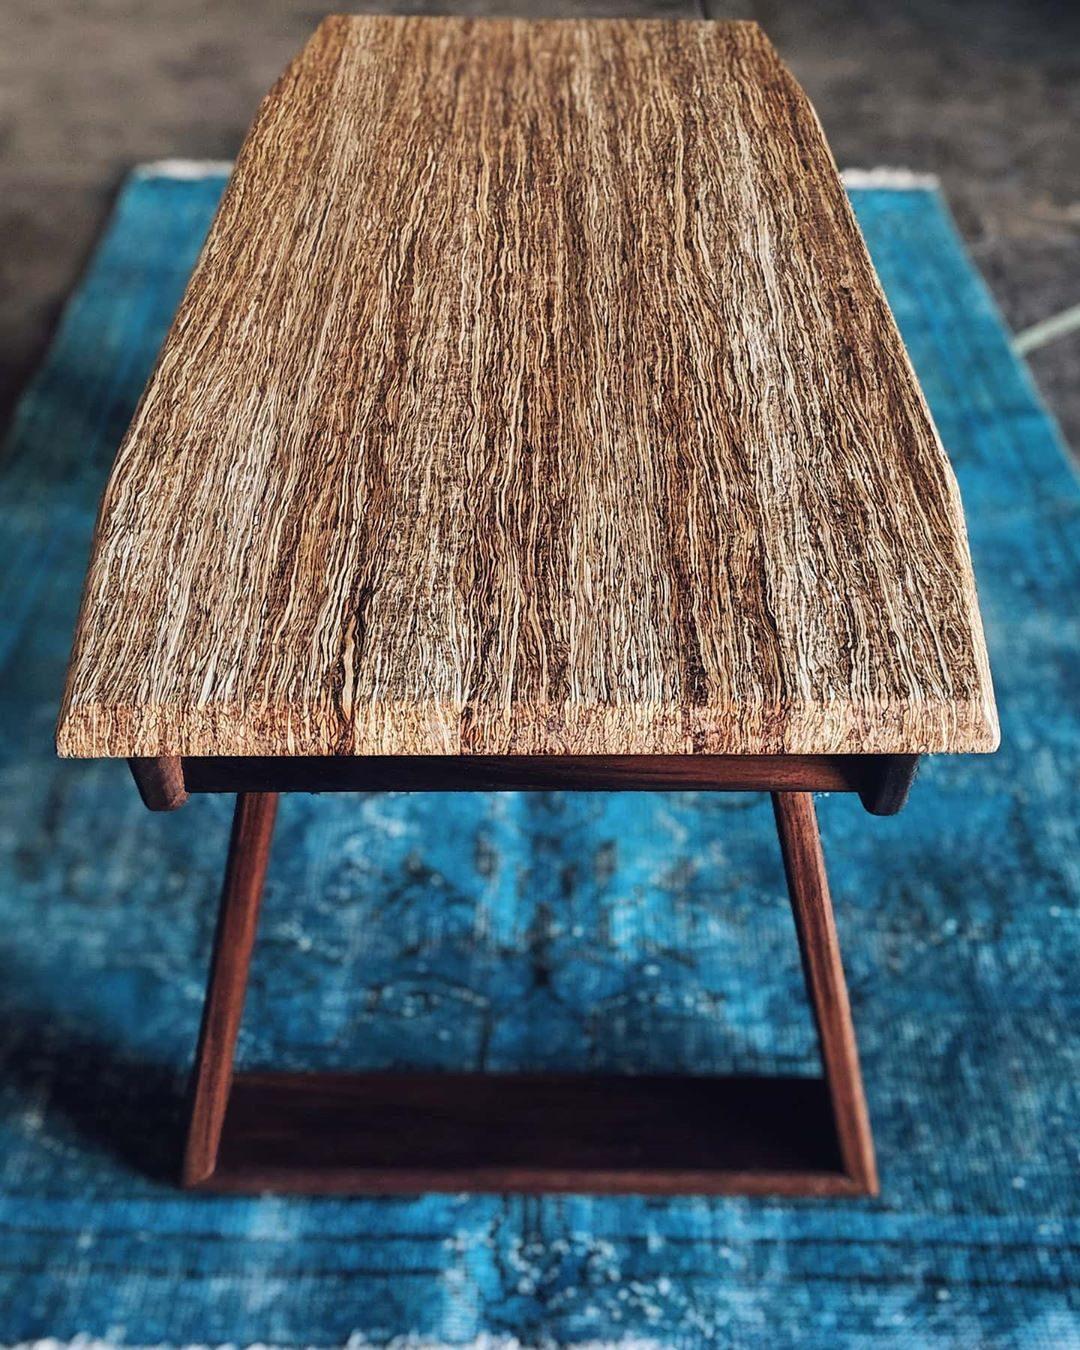 woodcrafting with hemp